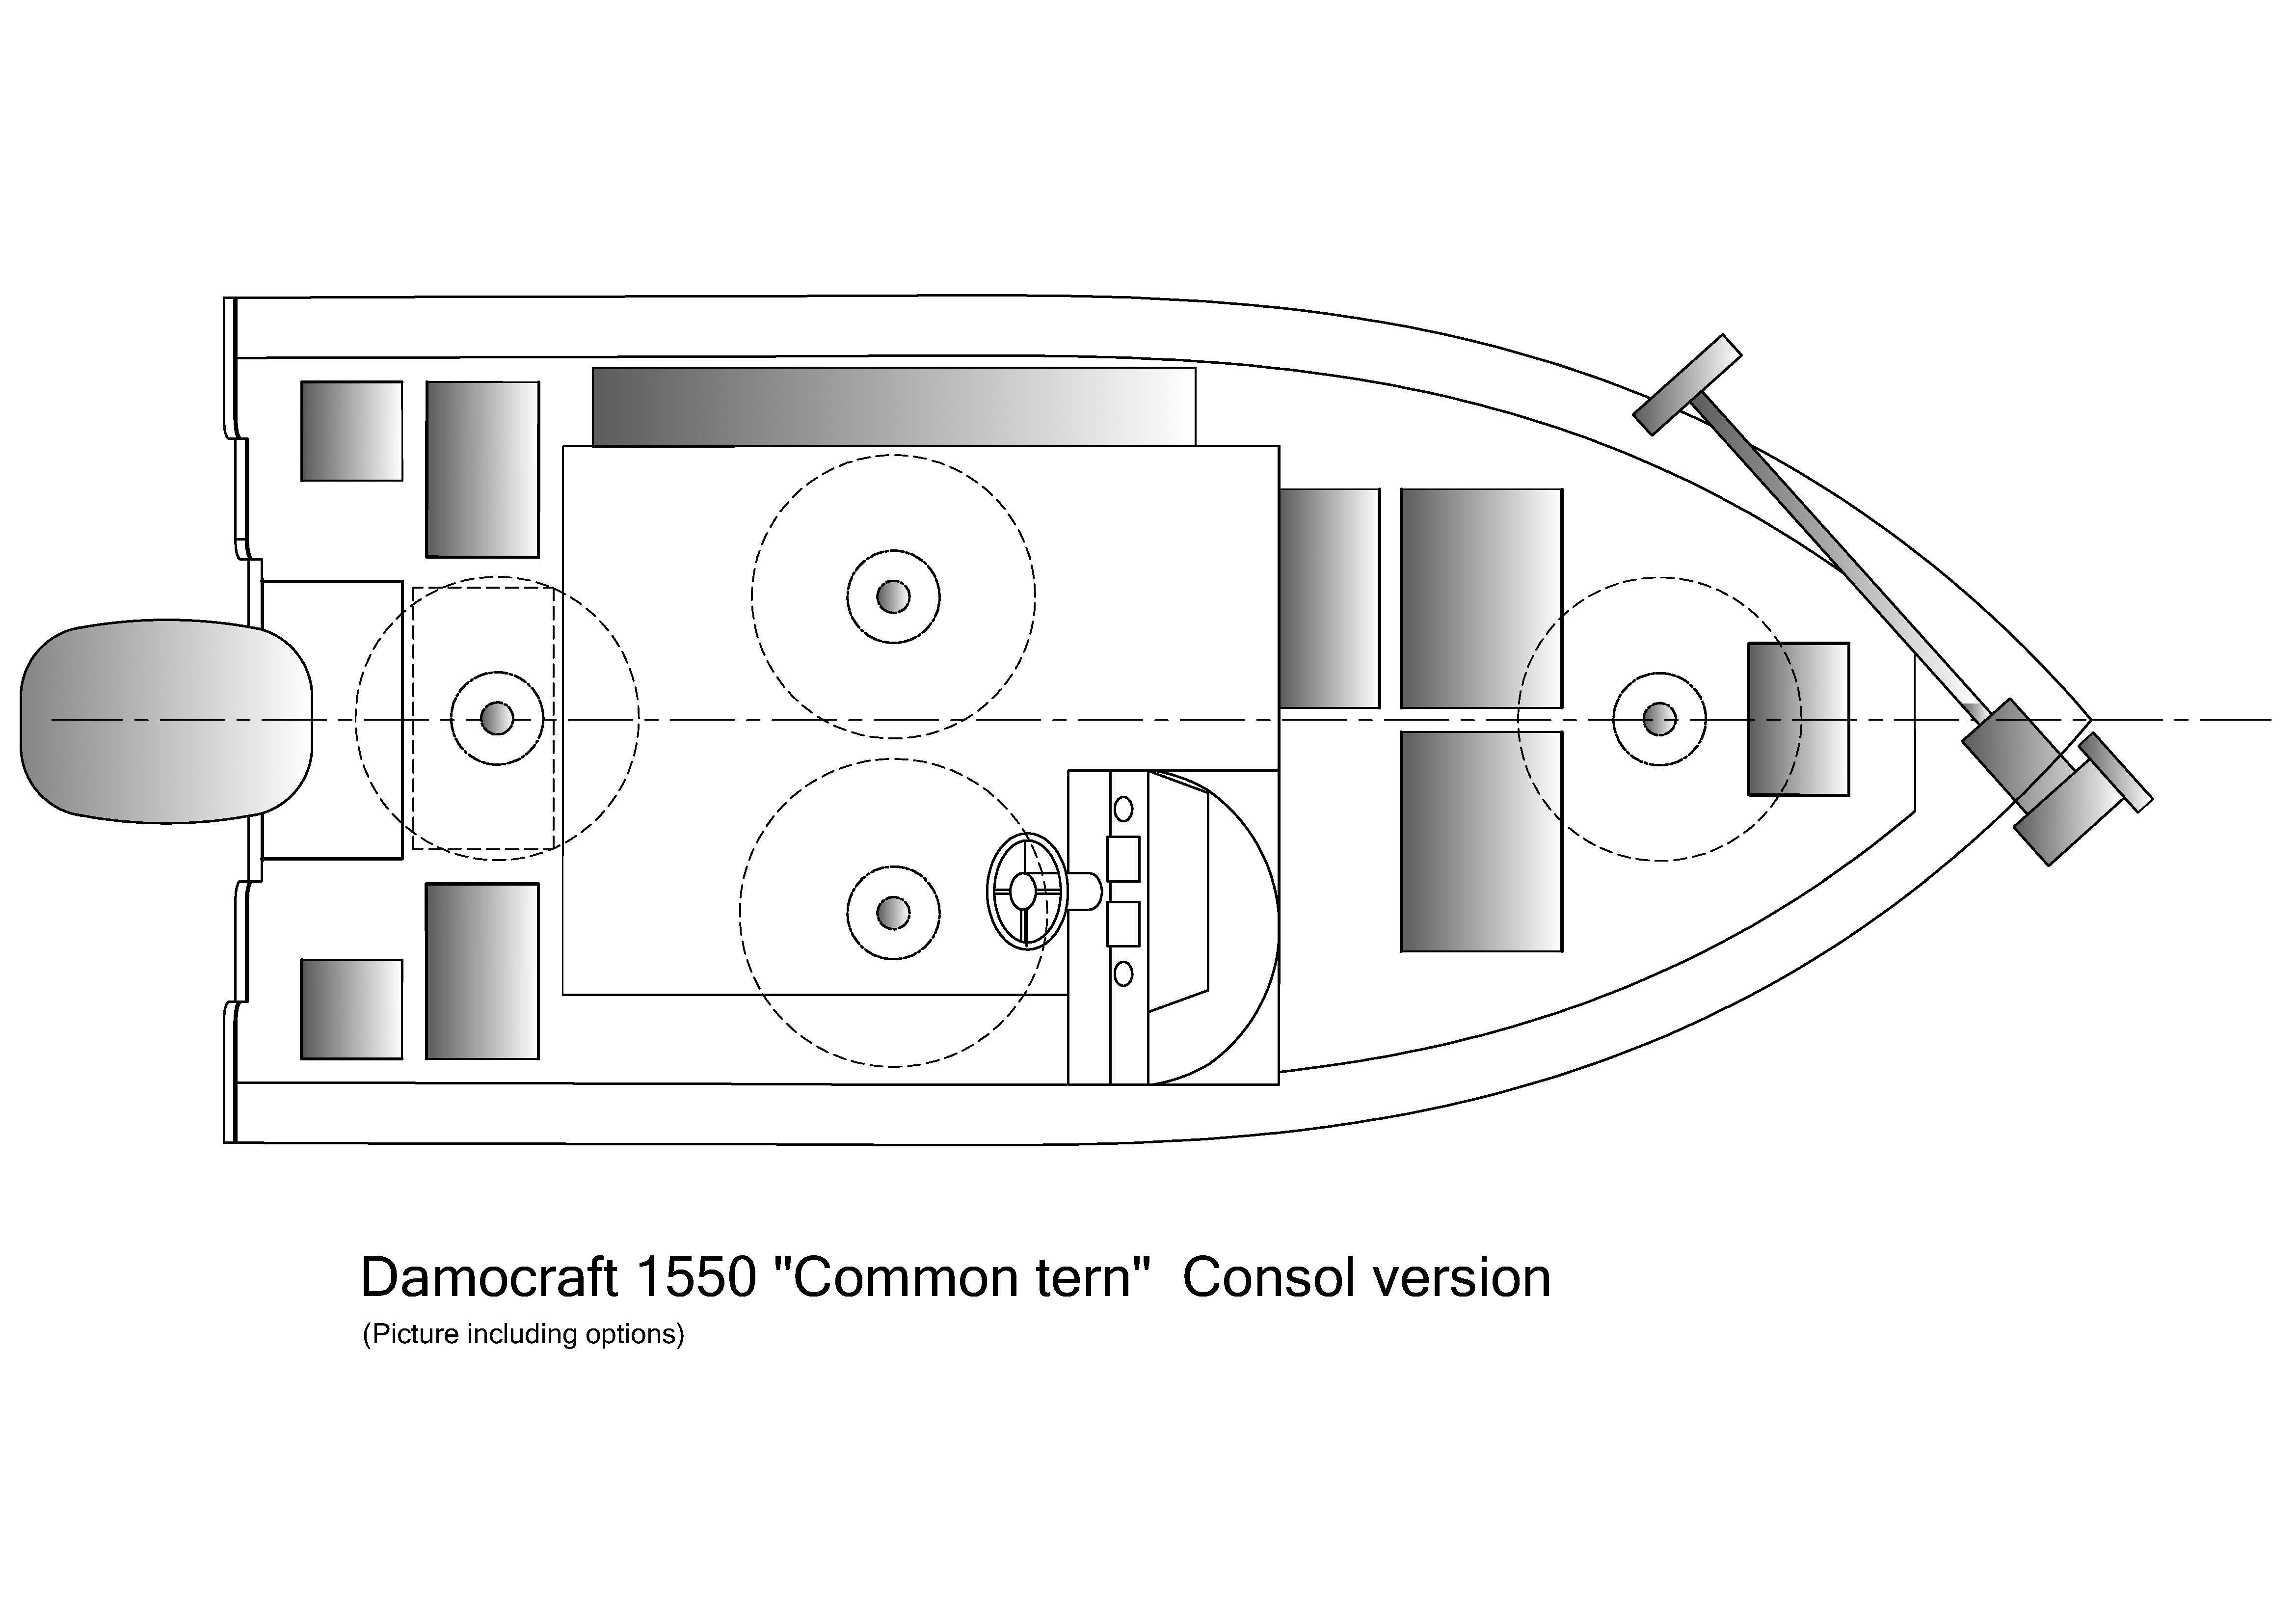 Damocraft 1550 Common tern Consol version